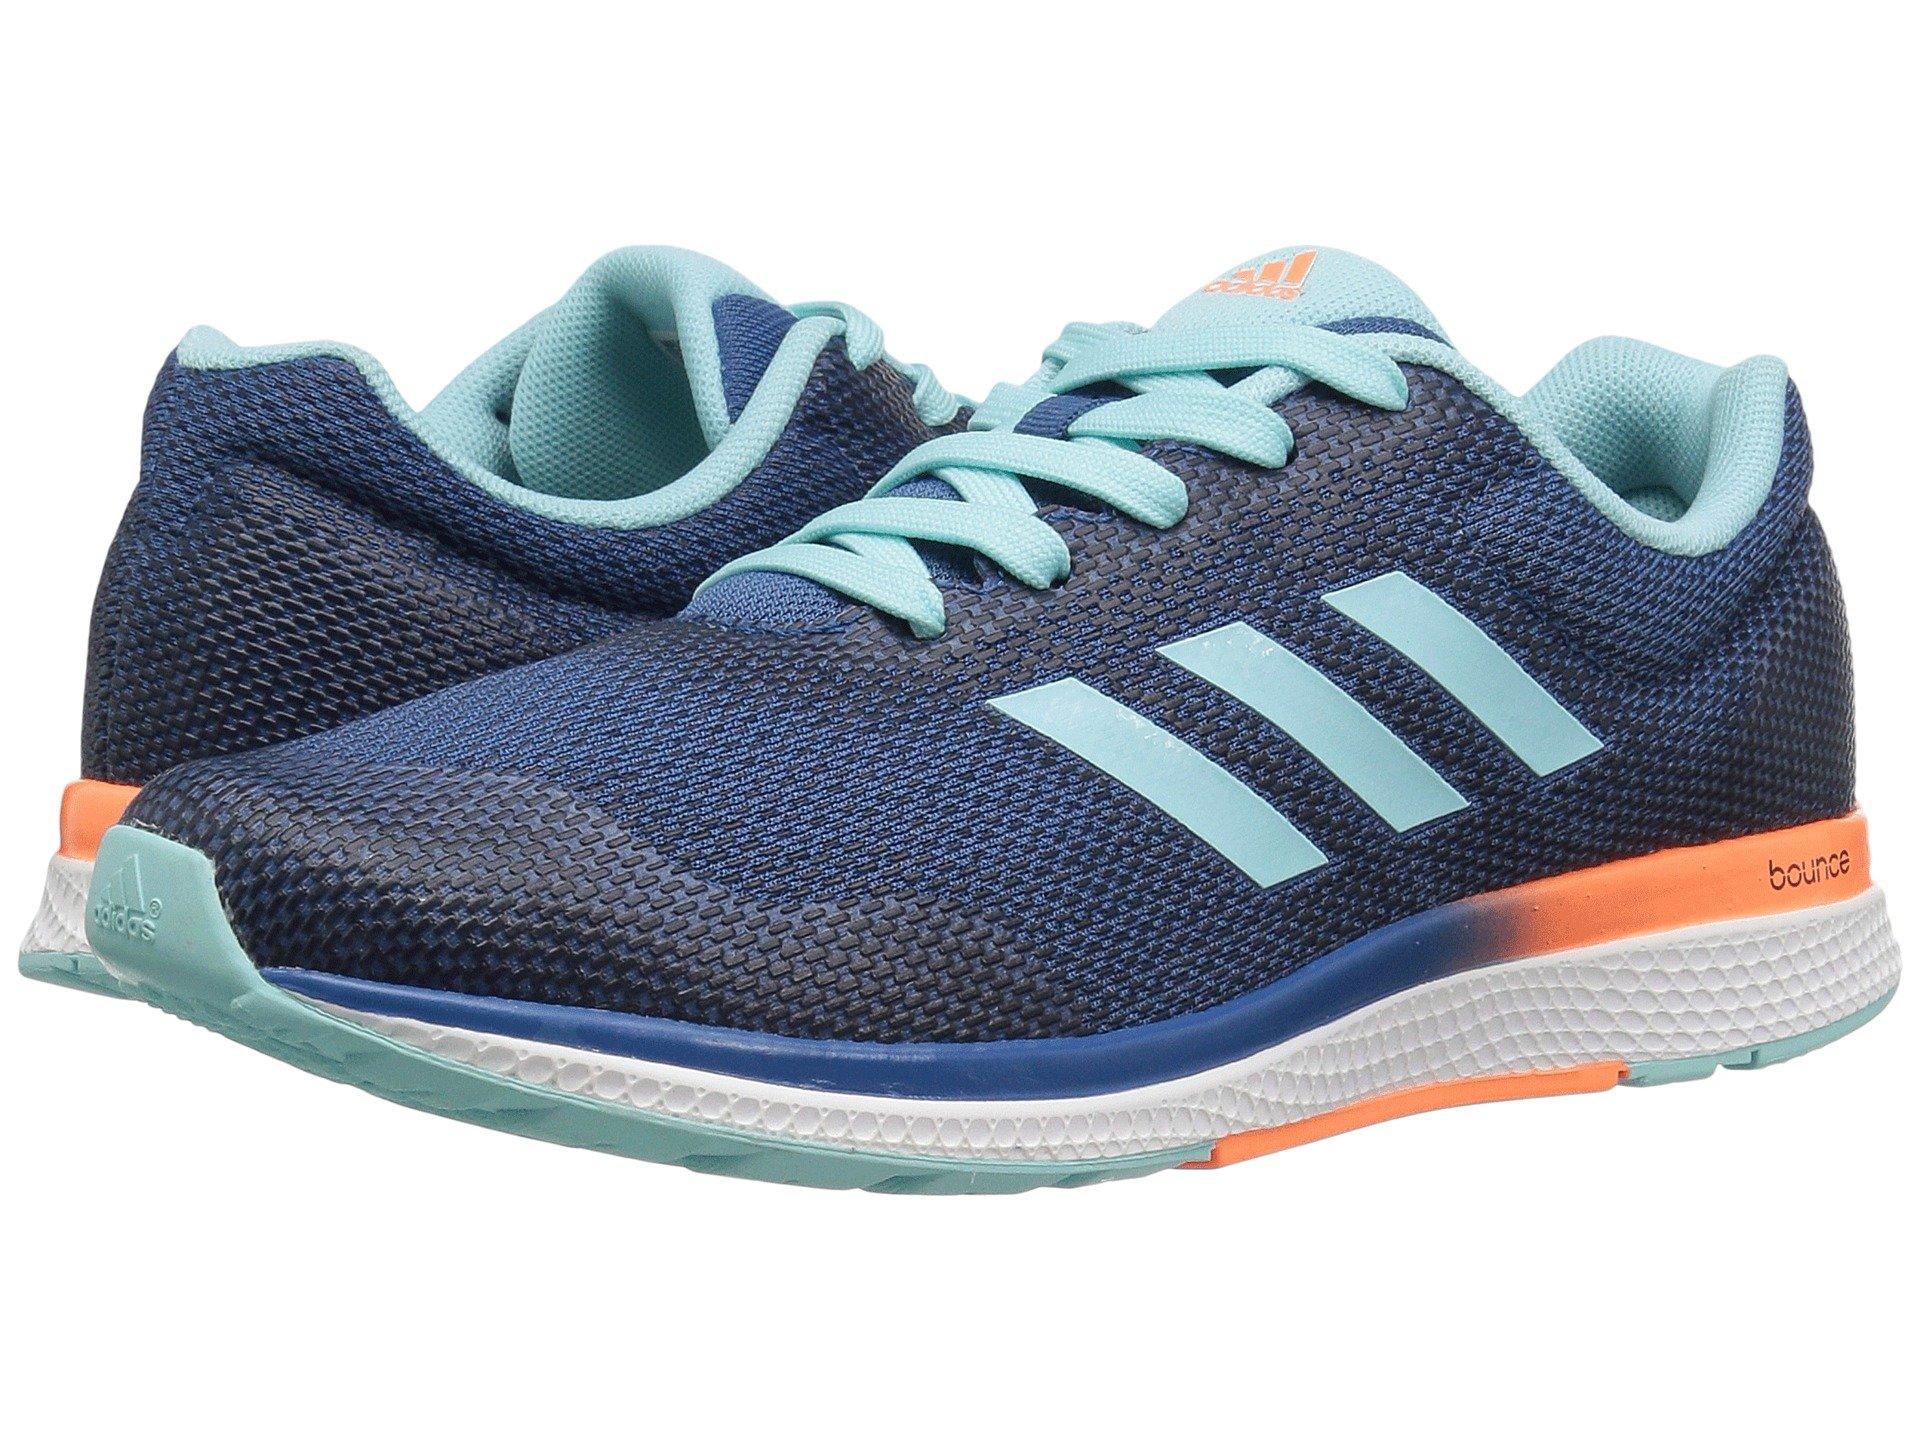 23d2d7fb1 Adidas Originals Mana Bounce 2 - Aramis In Mystery Blue Clear Aqua Glow  Orange